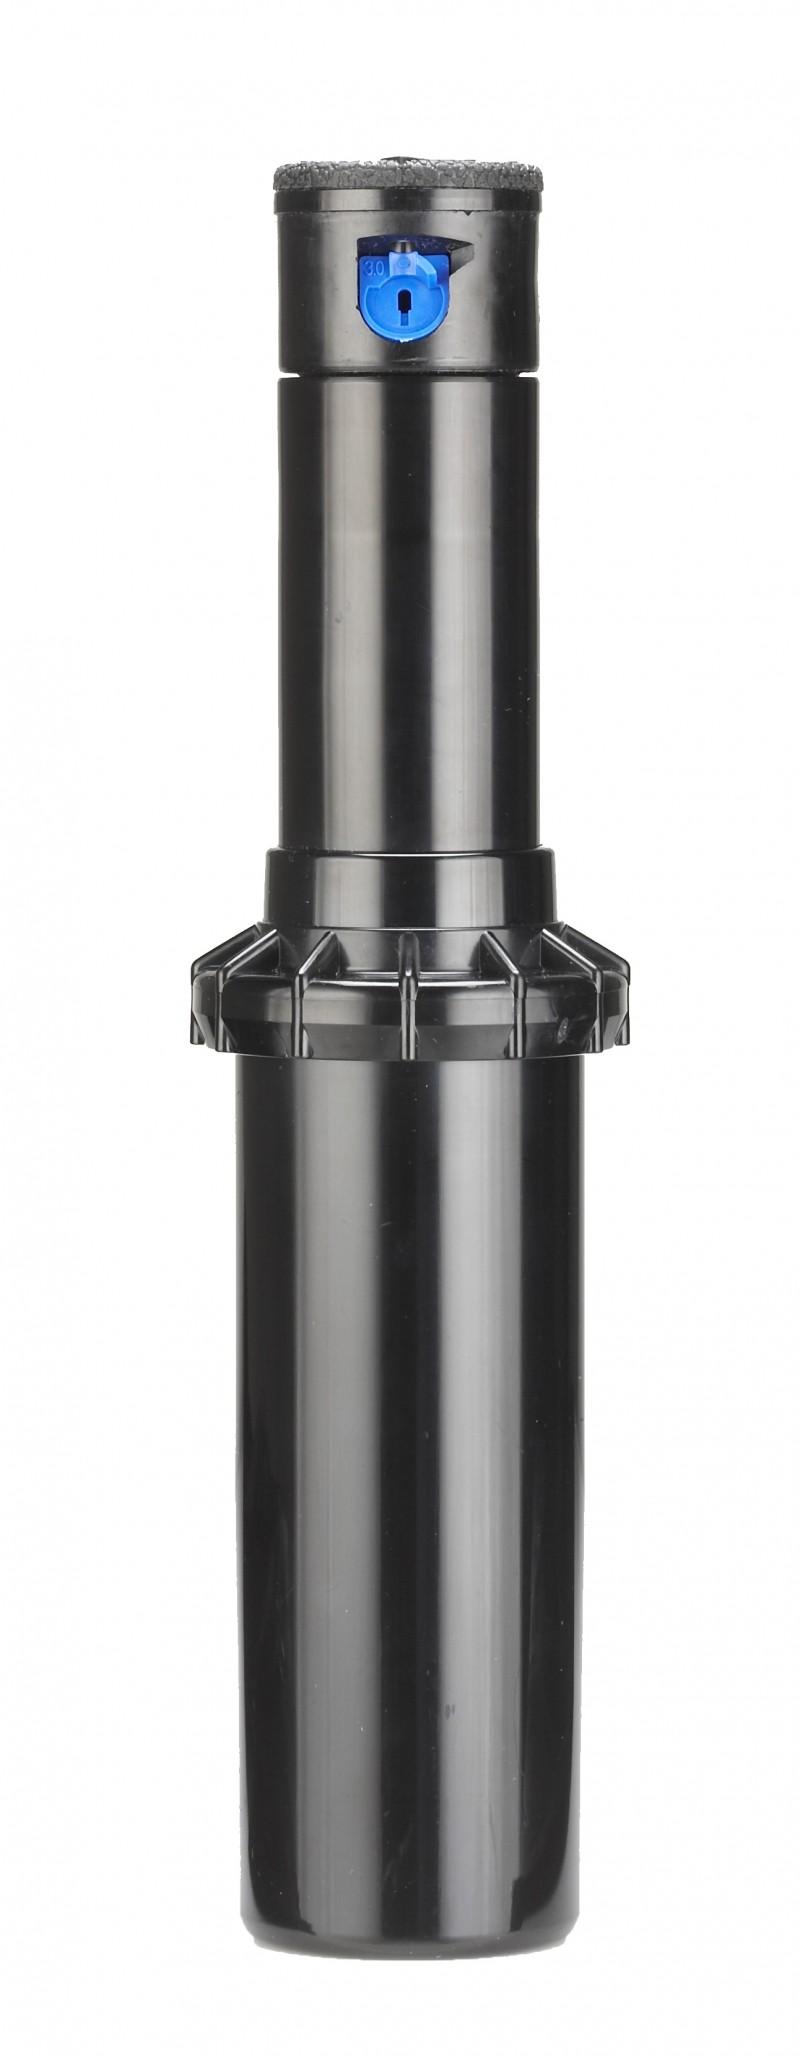 Aspersor rotativ PGP-ADJ/PGP-04, ridicare 10cm, cu 8 duze standard, 4 duze low angle si filet 3/4